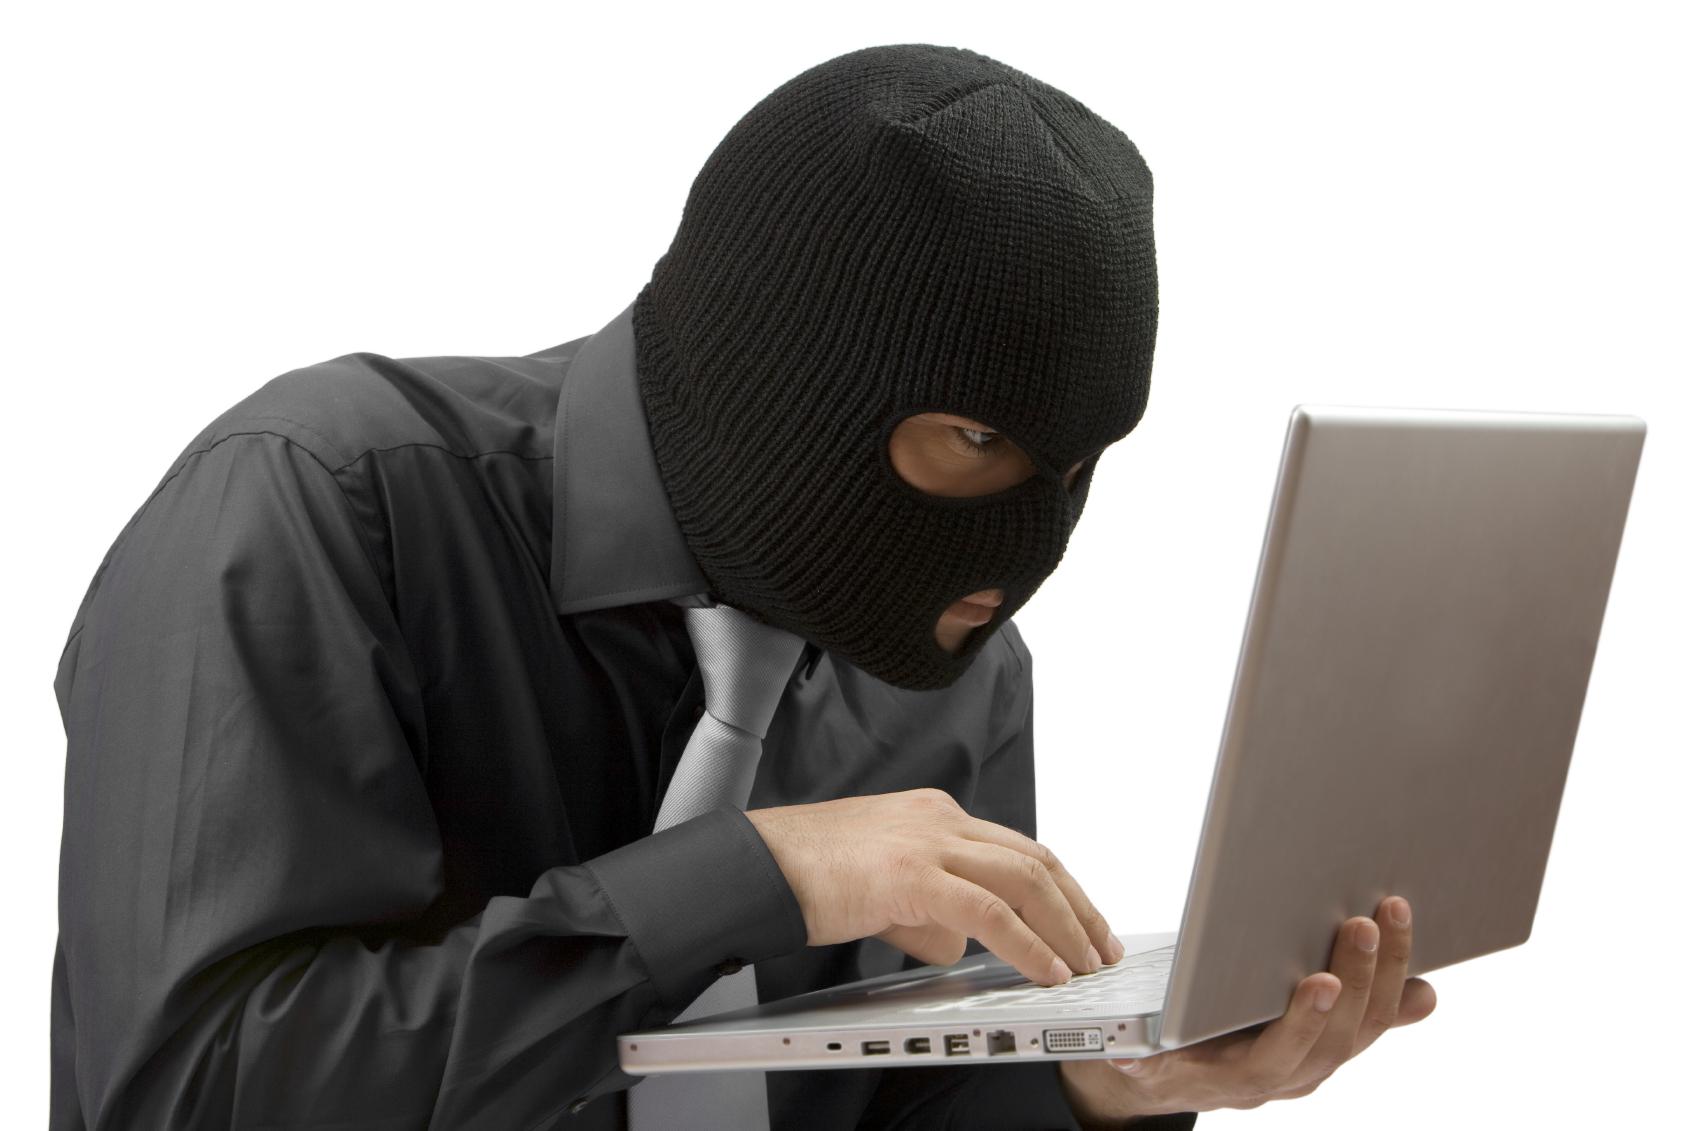 Account Hacker Xbox